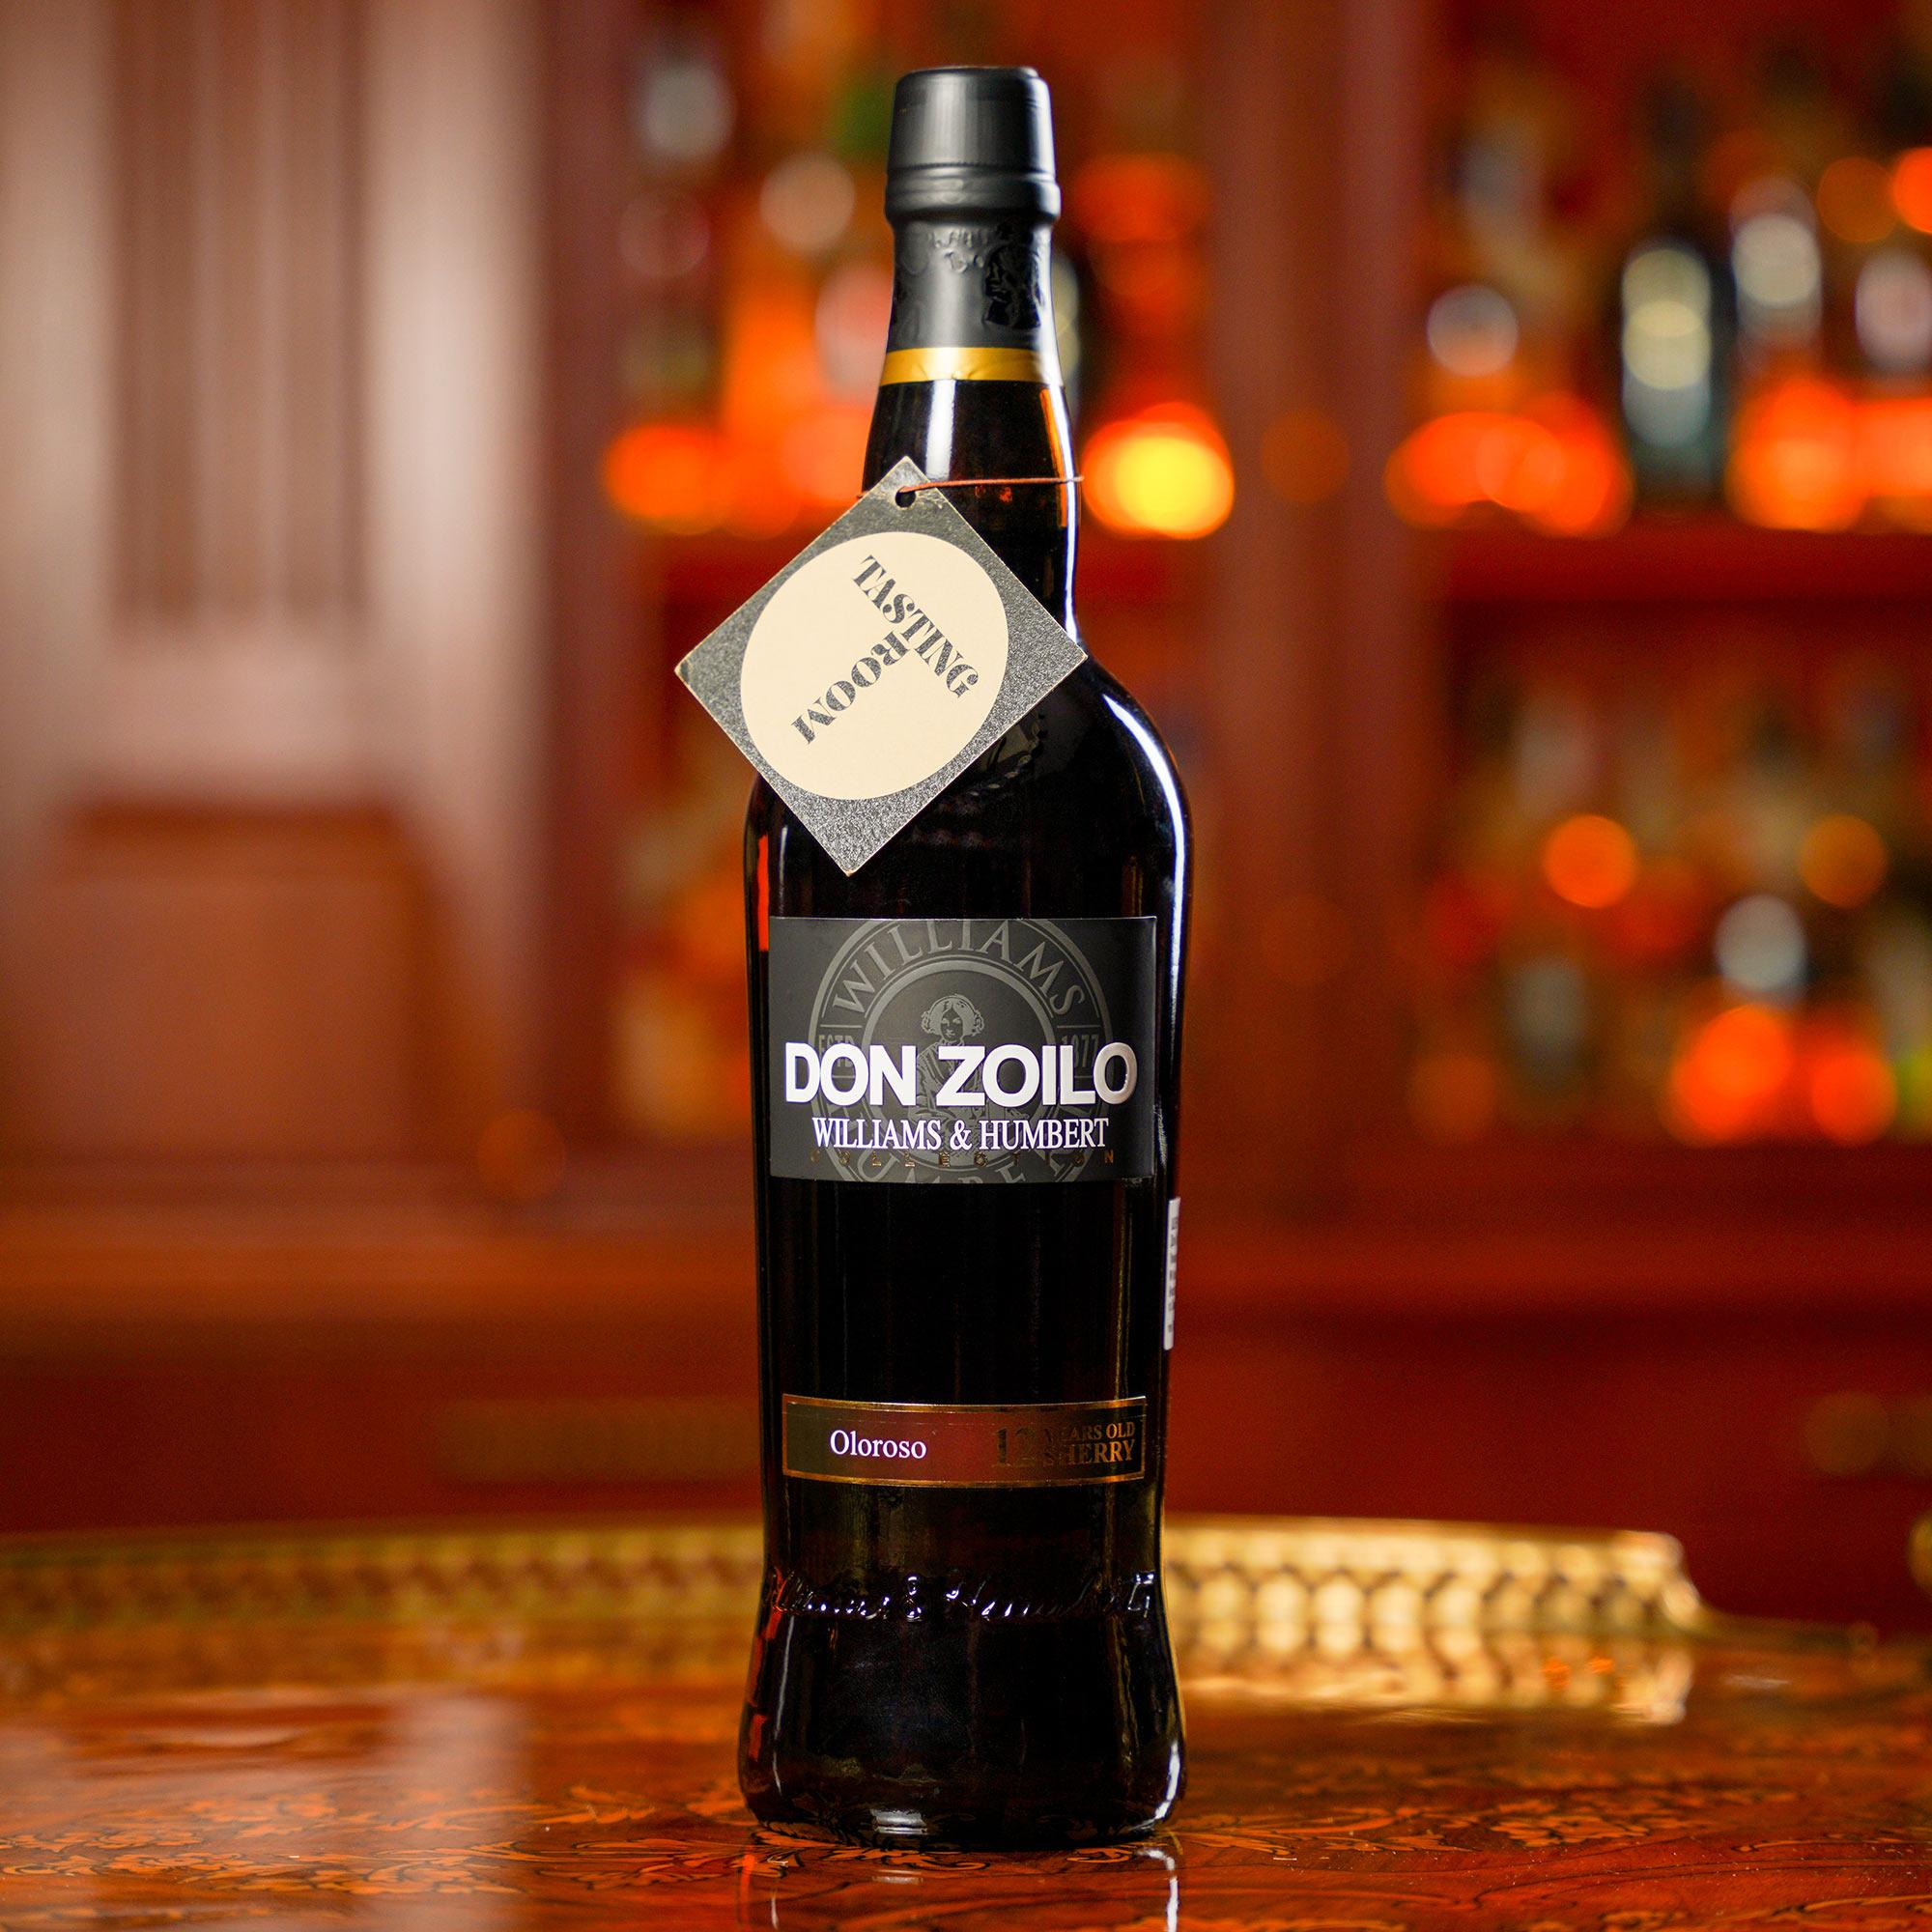 Don Zoilo Oloroso Sherry 12 YO /Дон Зоило Шери Олоросо 12 годишно